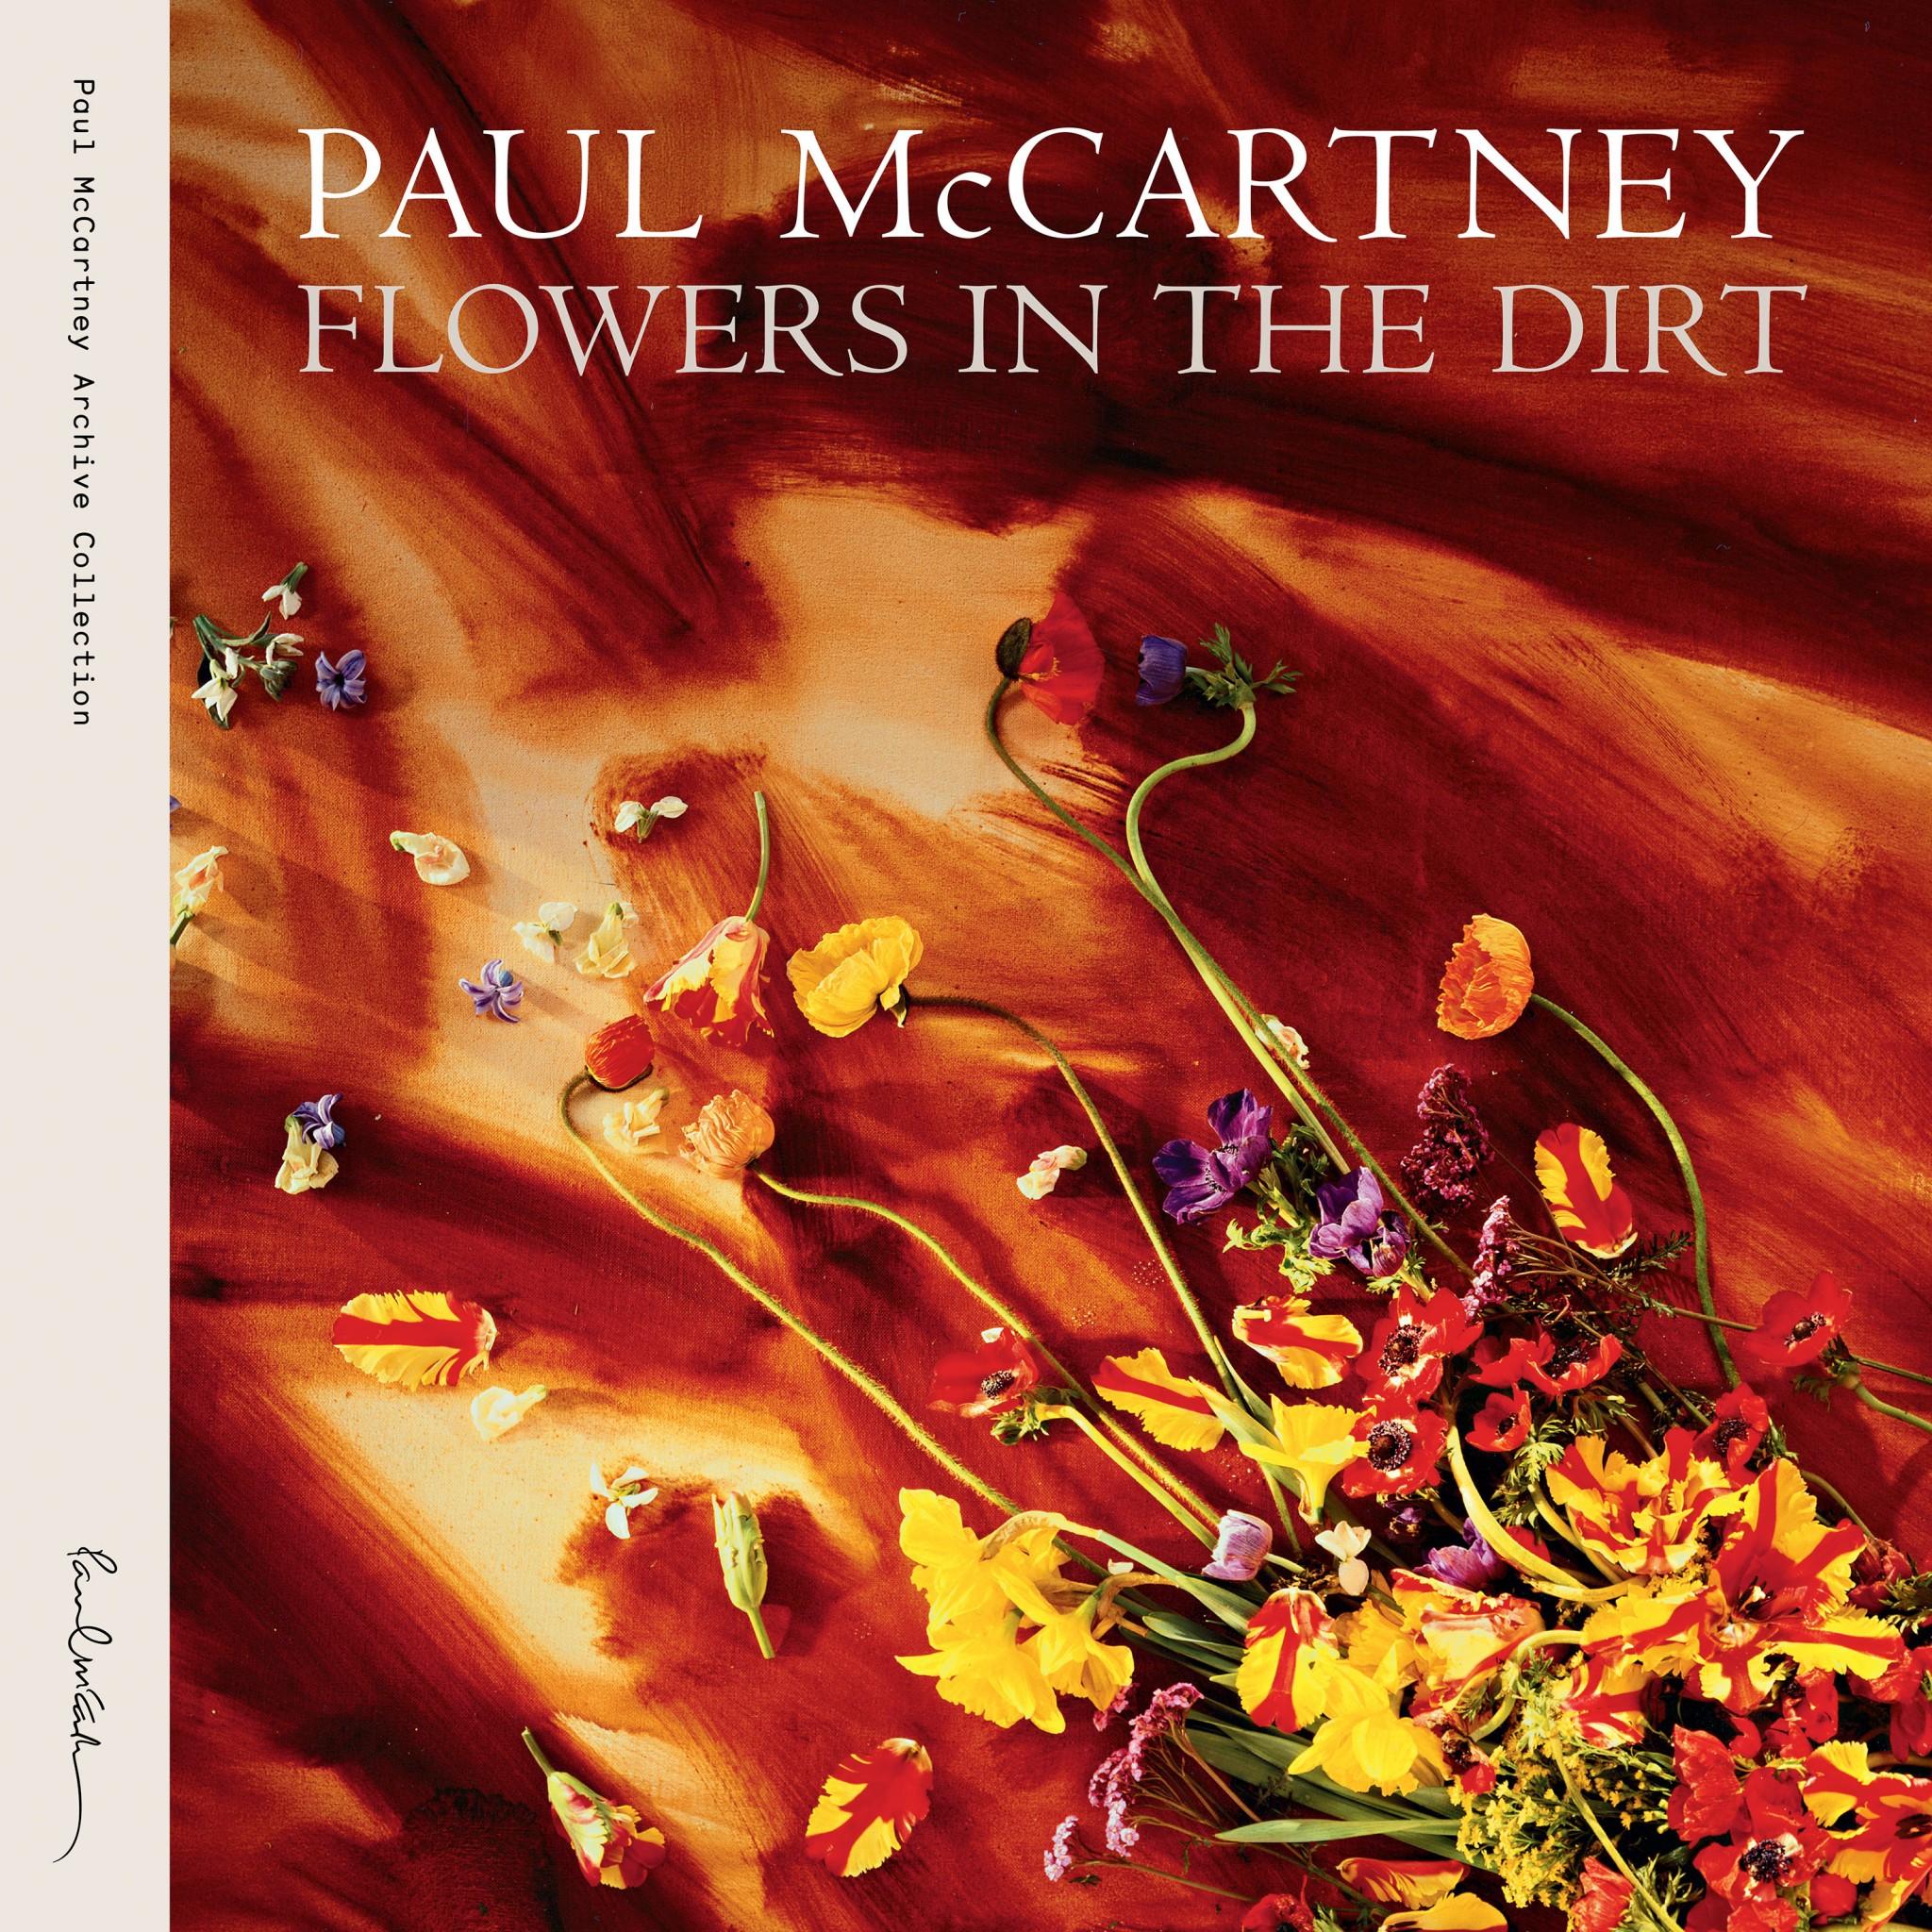 paul-mccartney-flowers-in-the-dirt-cover-art